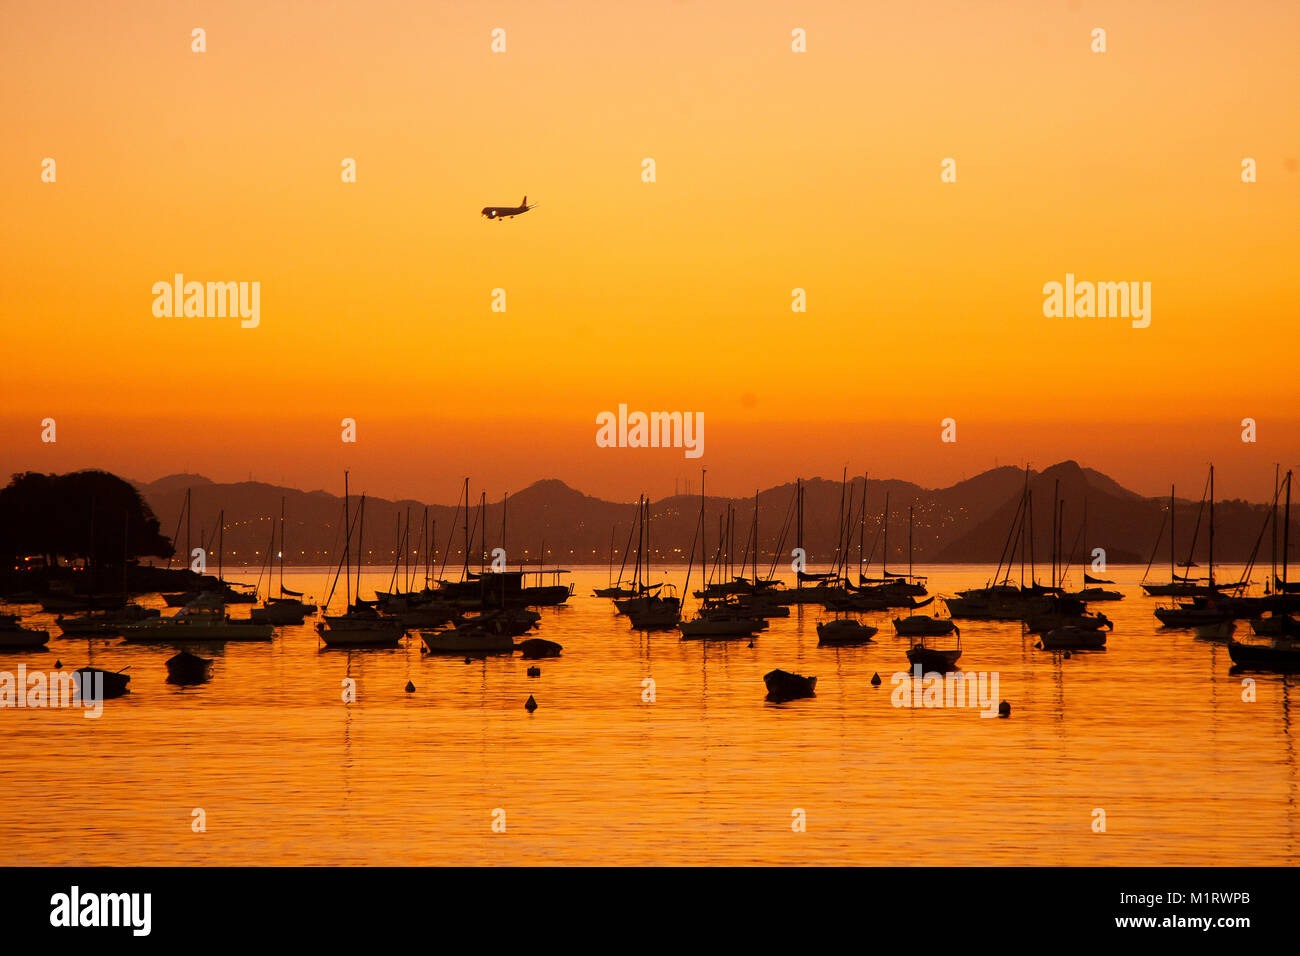 Early in the morning in Botafogo beach at Guanabara Bay, Rio de Janeiro, Brazil - Stock Image